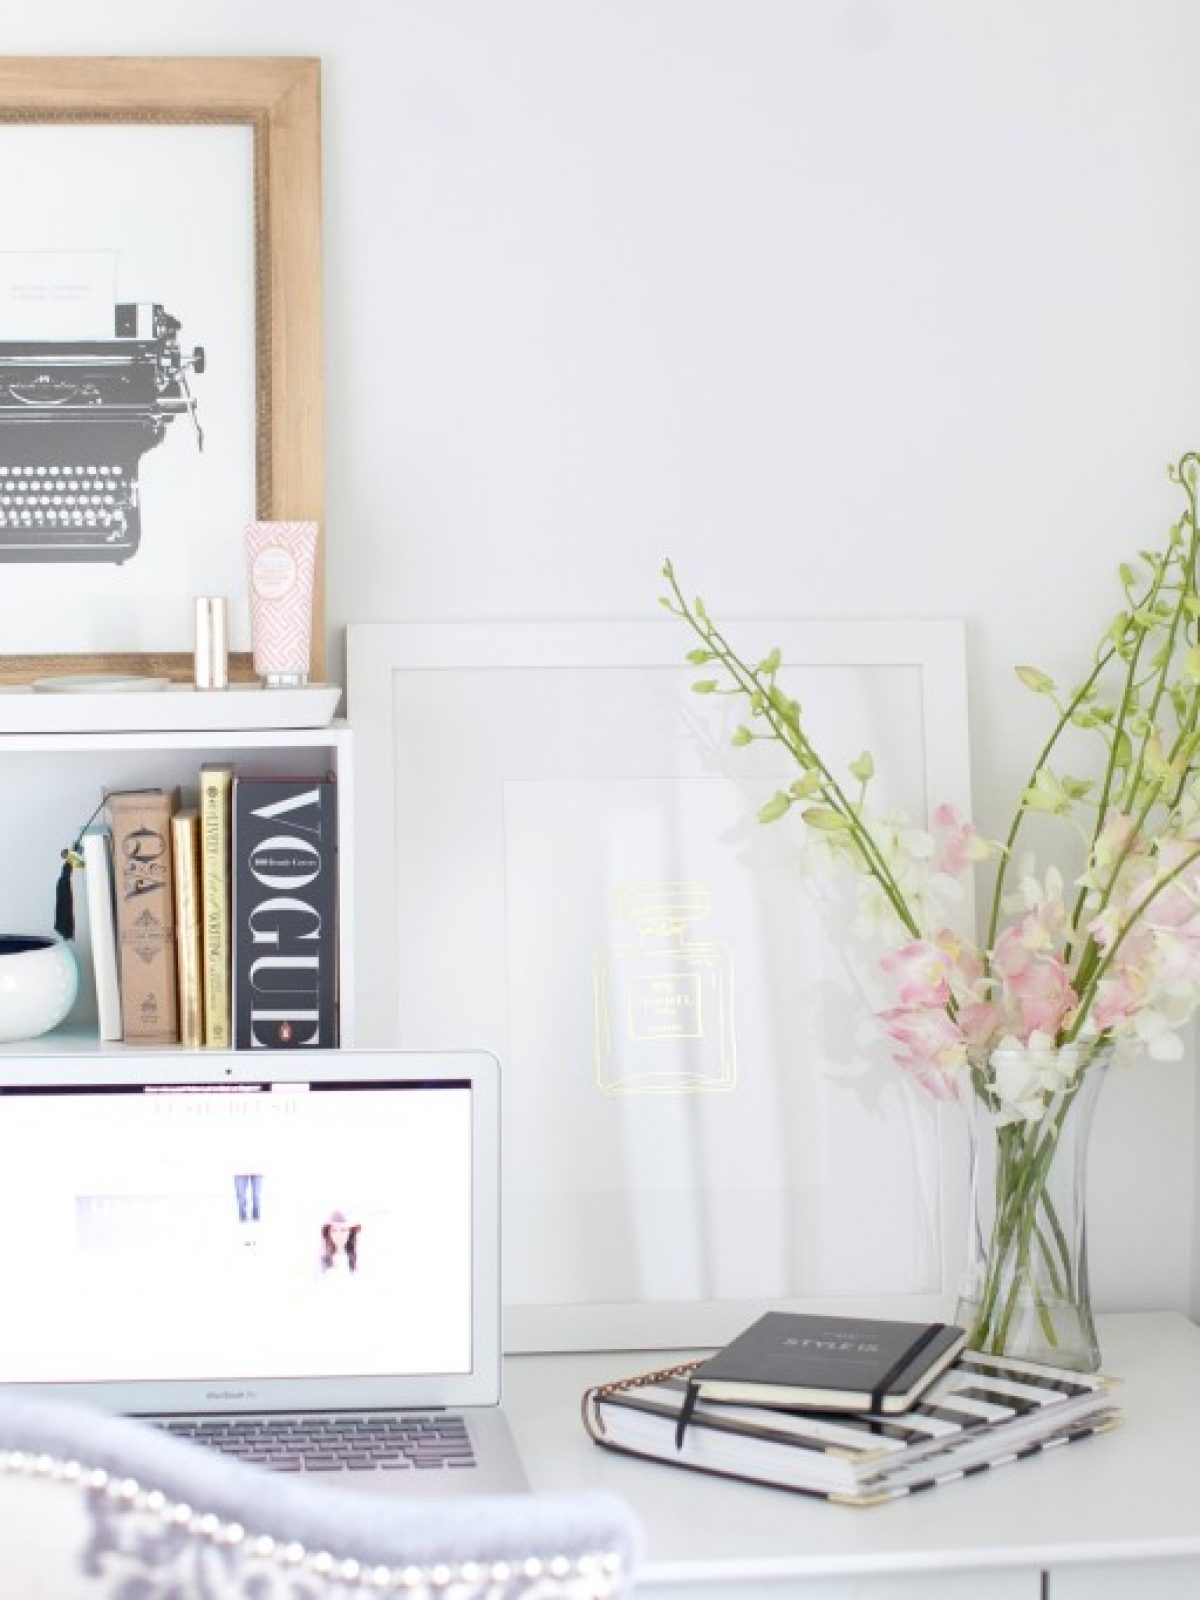 home office essentials, blog talk, blogging, desk styling tips